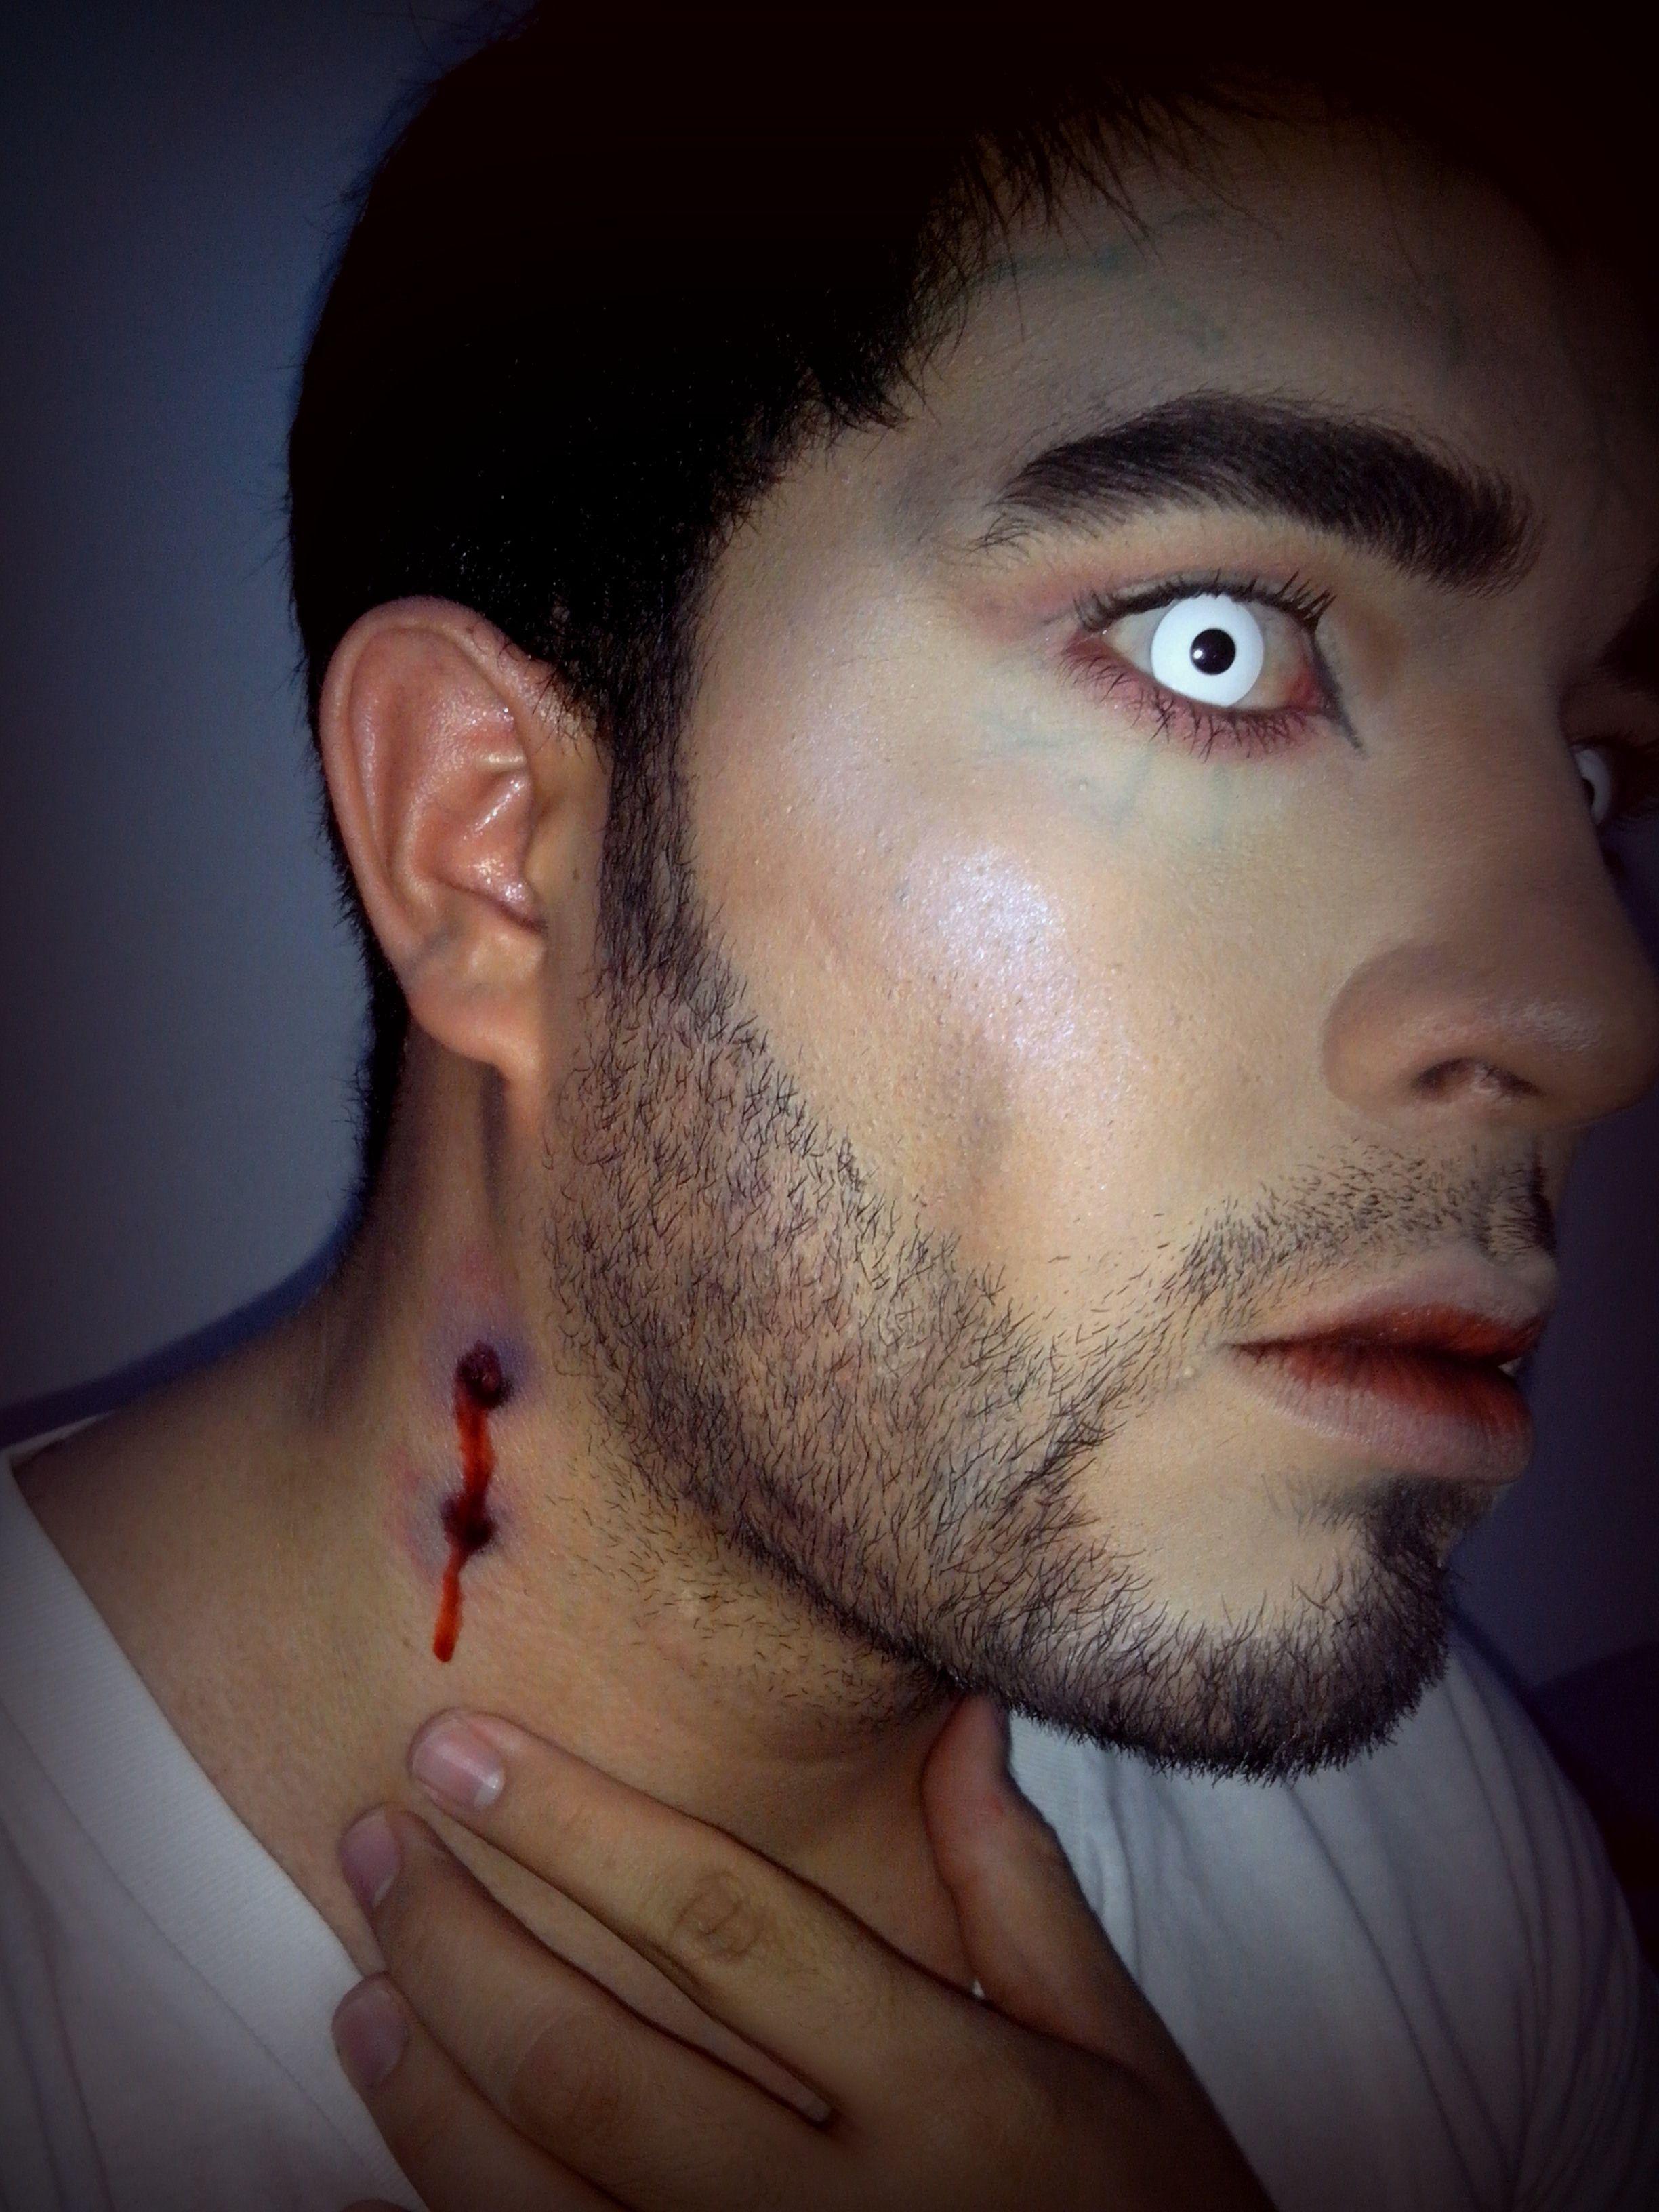 halloween makeup vampire man - photo #5